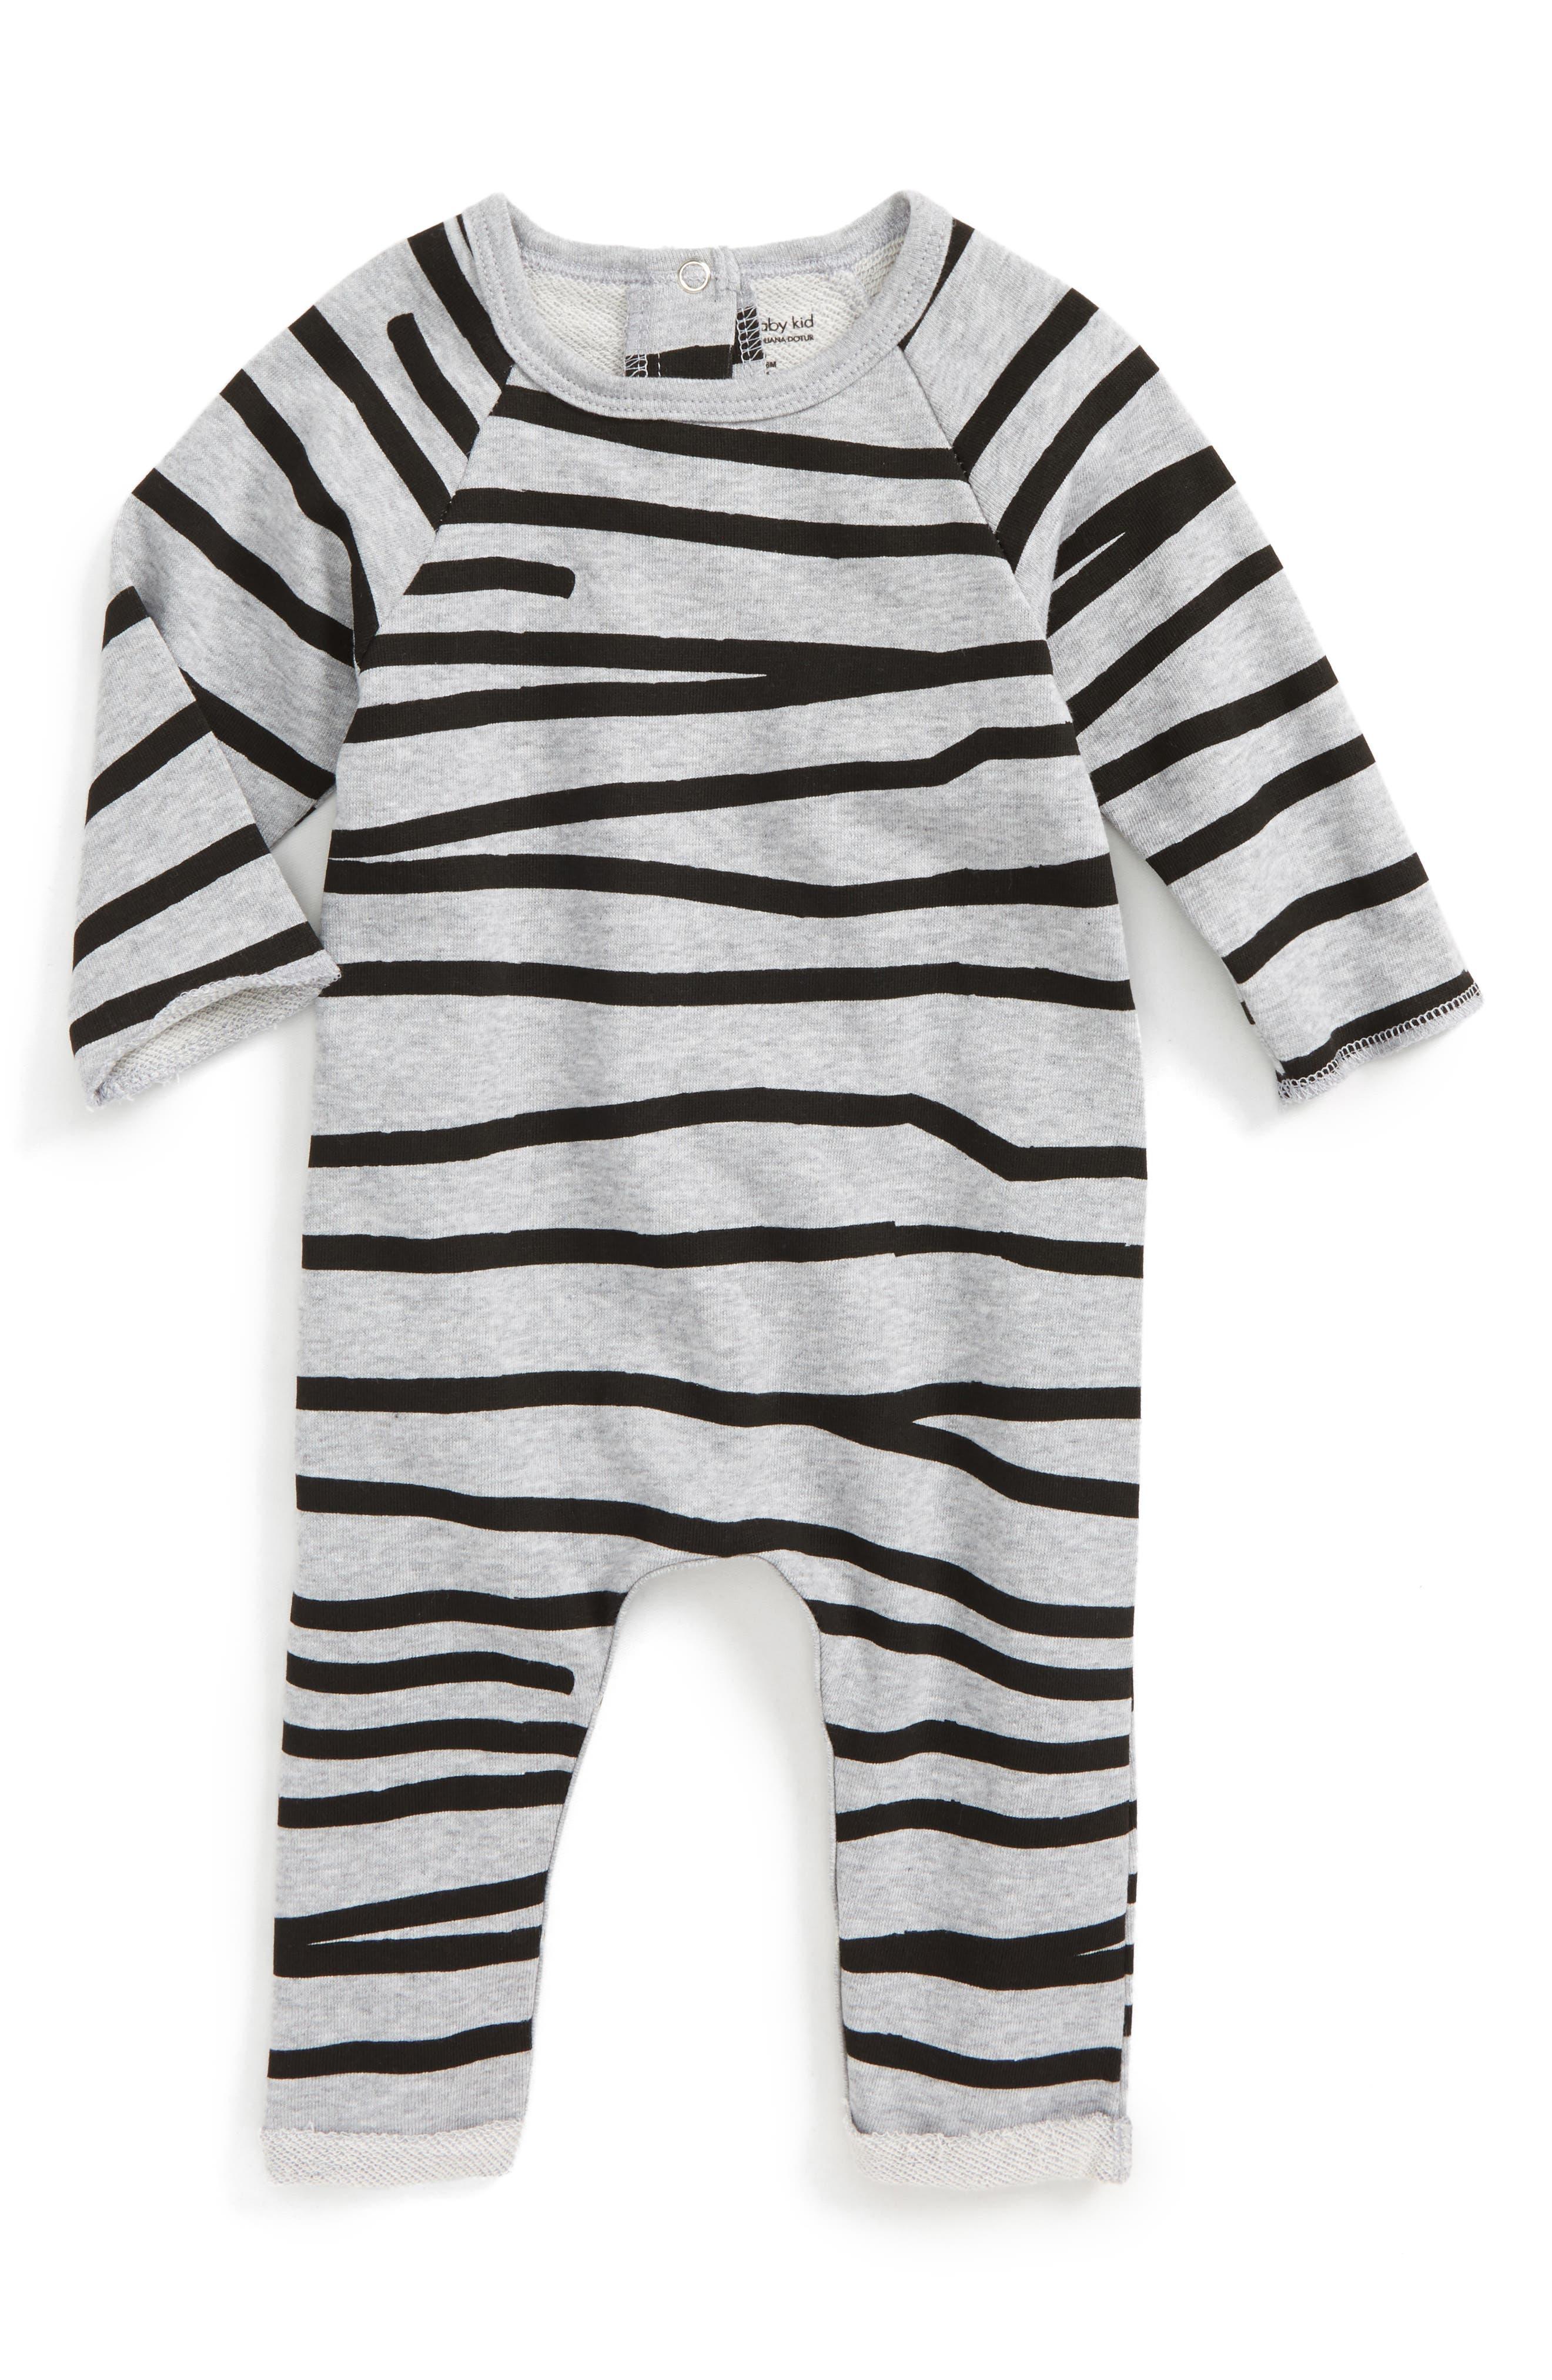 Stripe Romper,                             Main thumbnail 1, color,                             Grey Marle/ Black